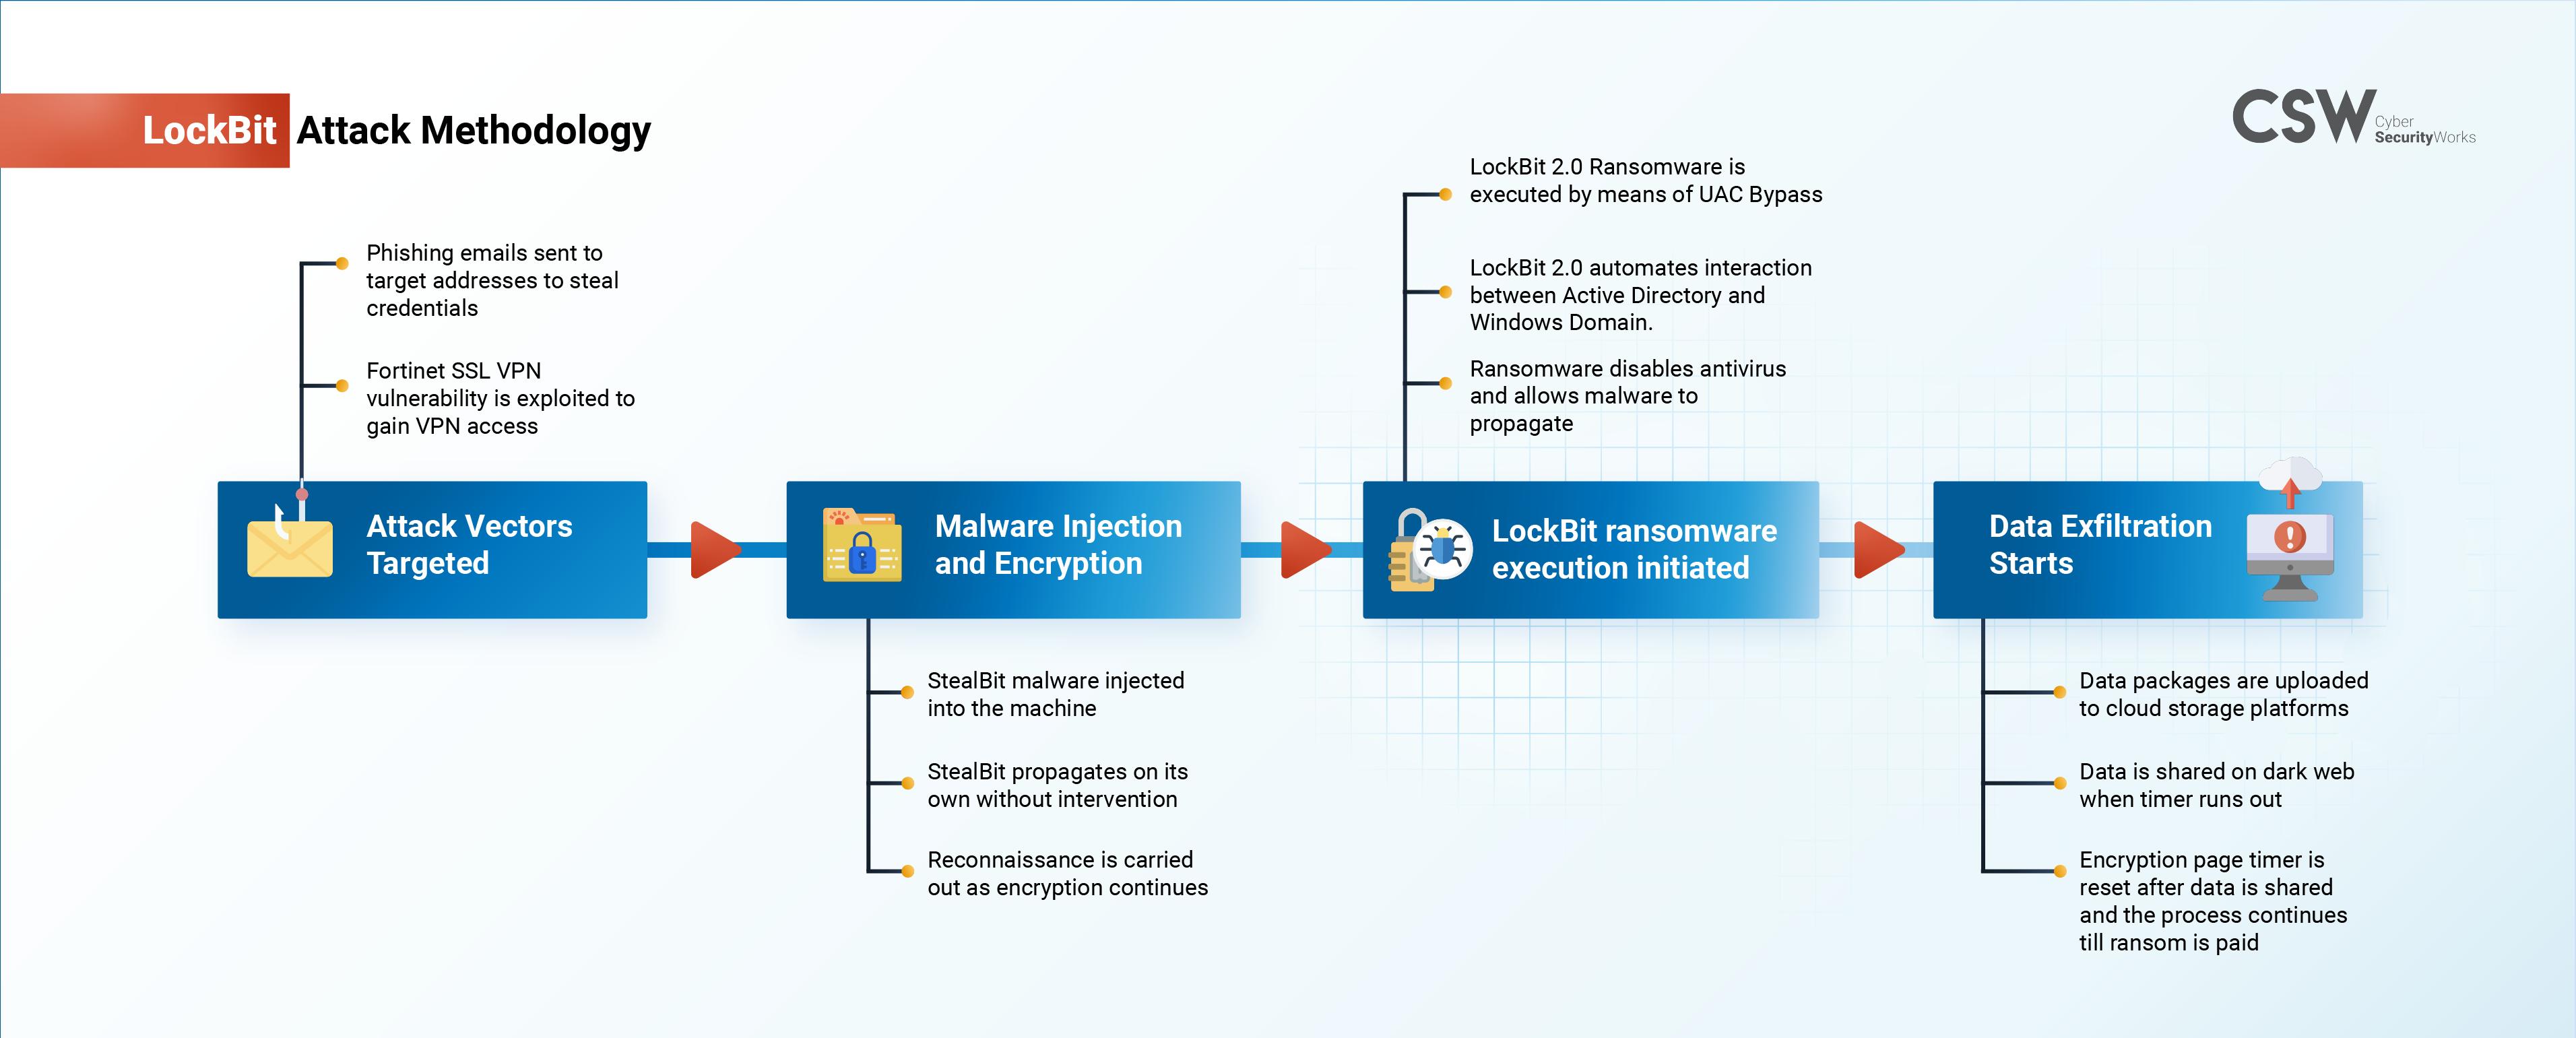 Accenture Lockbit Attack Methodology